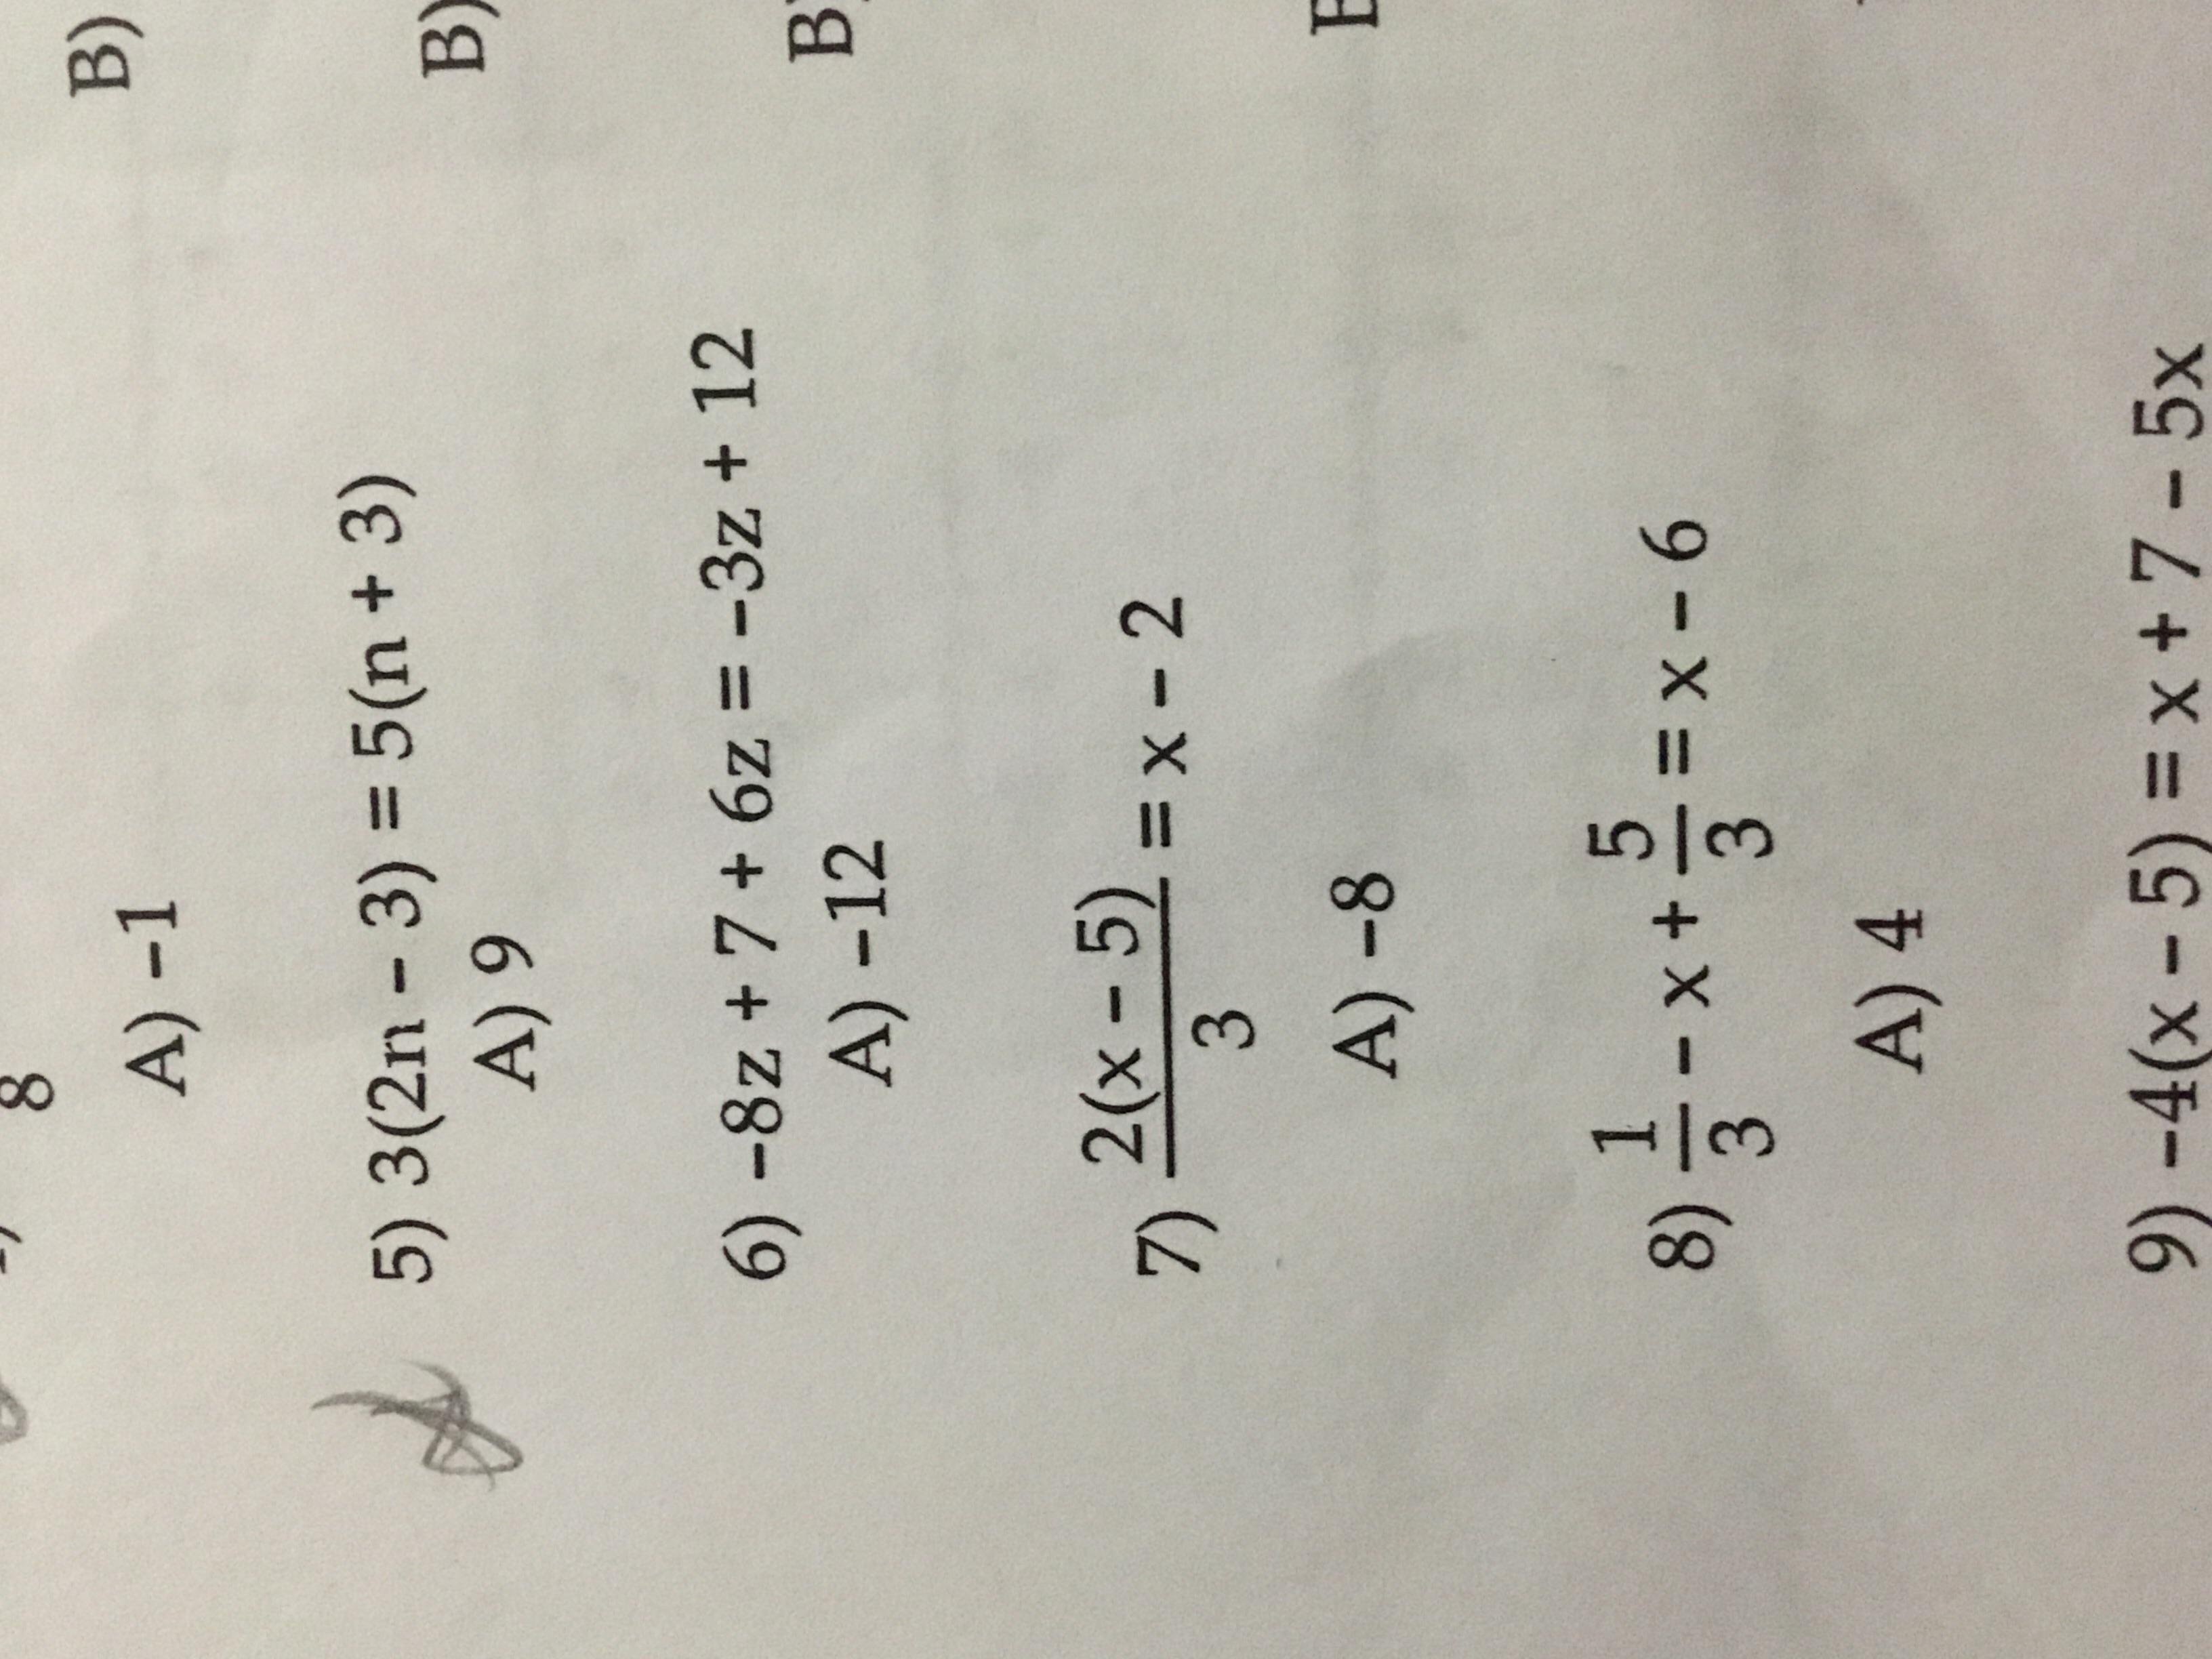 A) -1 B) 5) 3(2n-3) = 5(n + 3) A) 9 B) A) -12 2(x-5) 7) = x-2 A) -8 3 A) 4 9)-4(x-5) = x + 7-5x